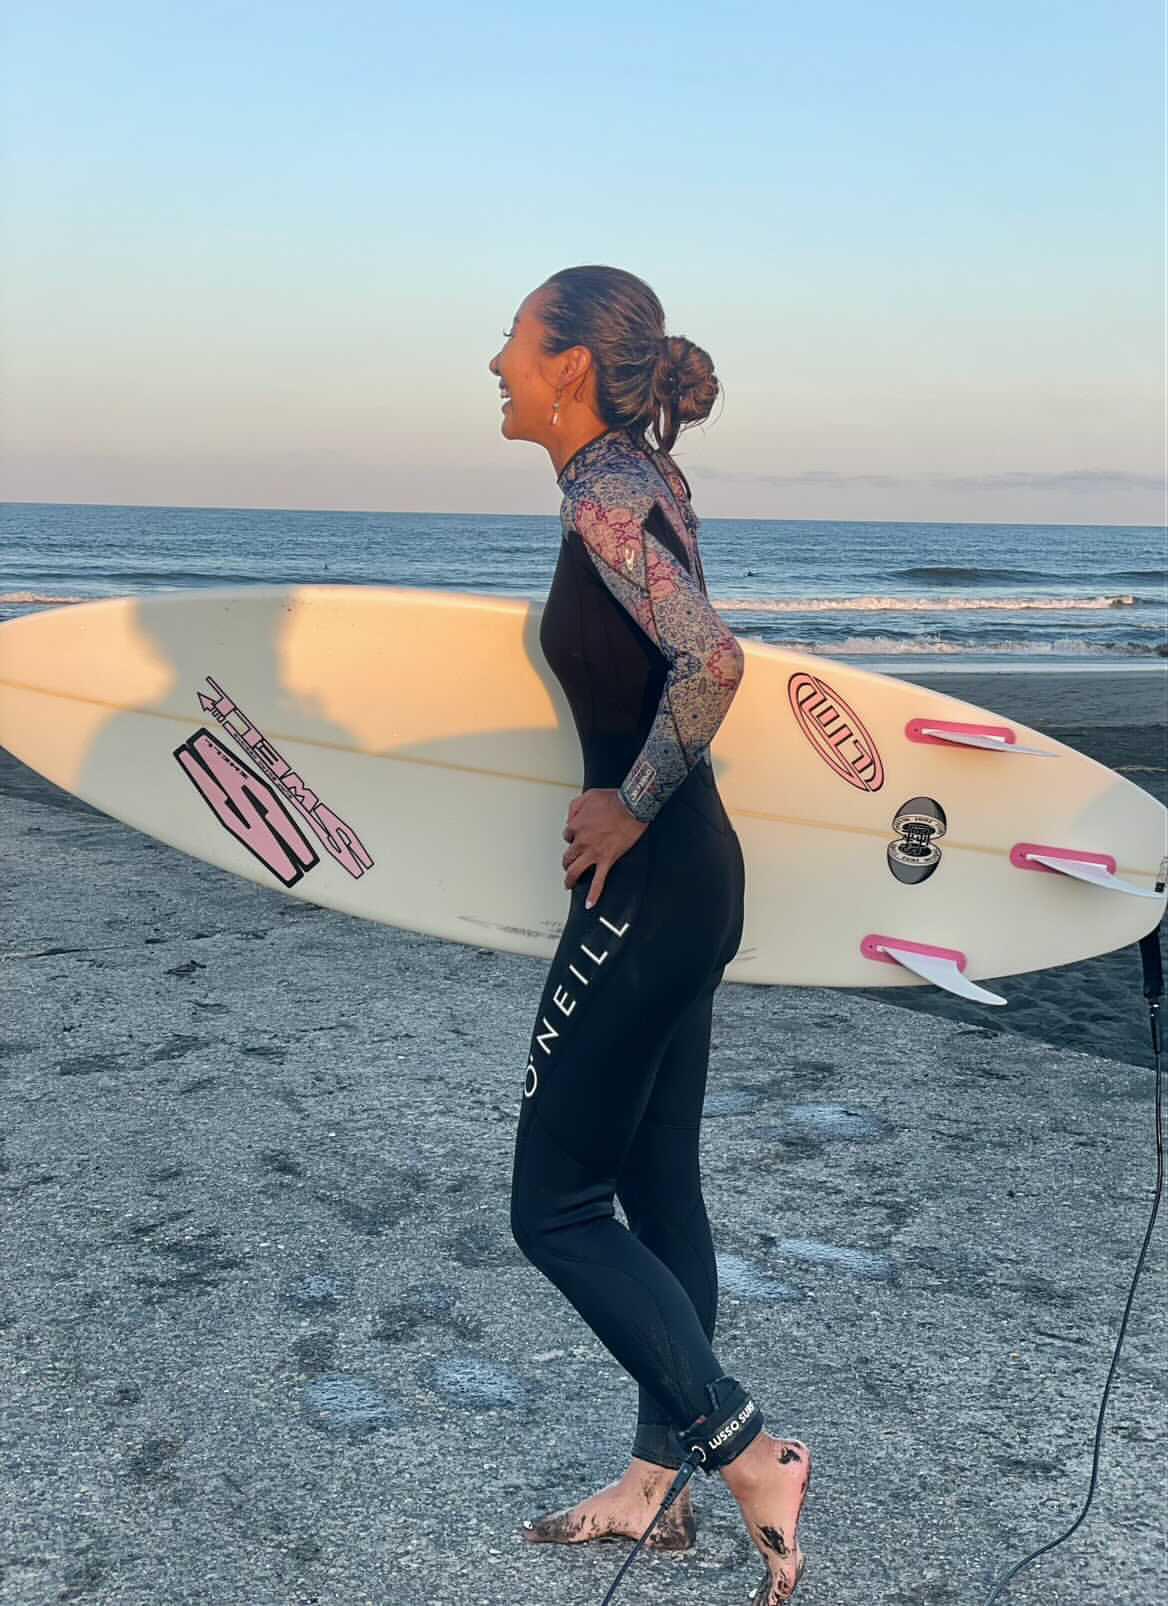 LUSSO SURF リーシュコード発売中